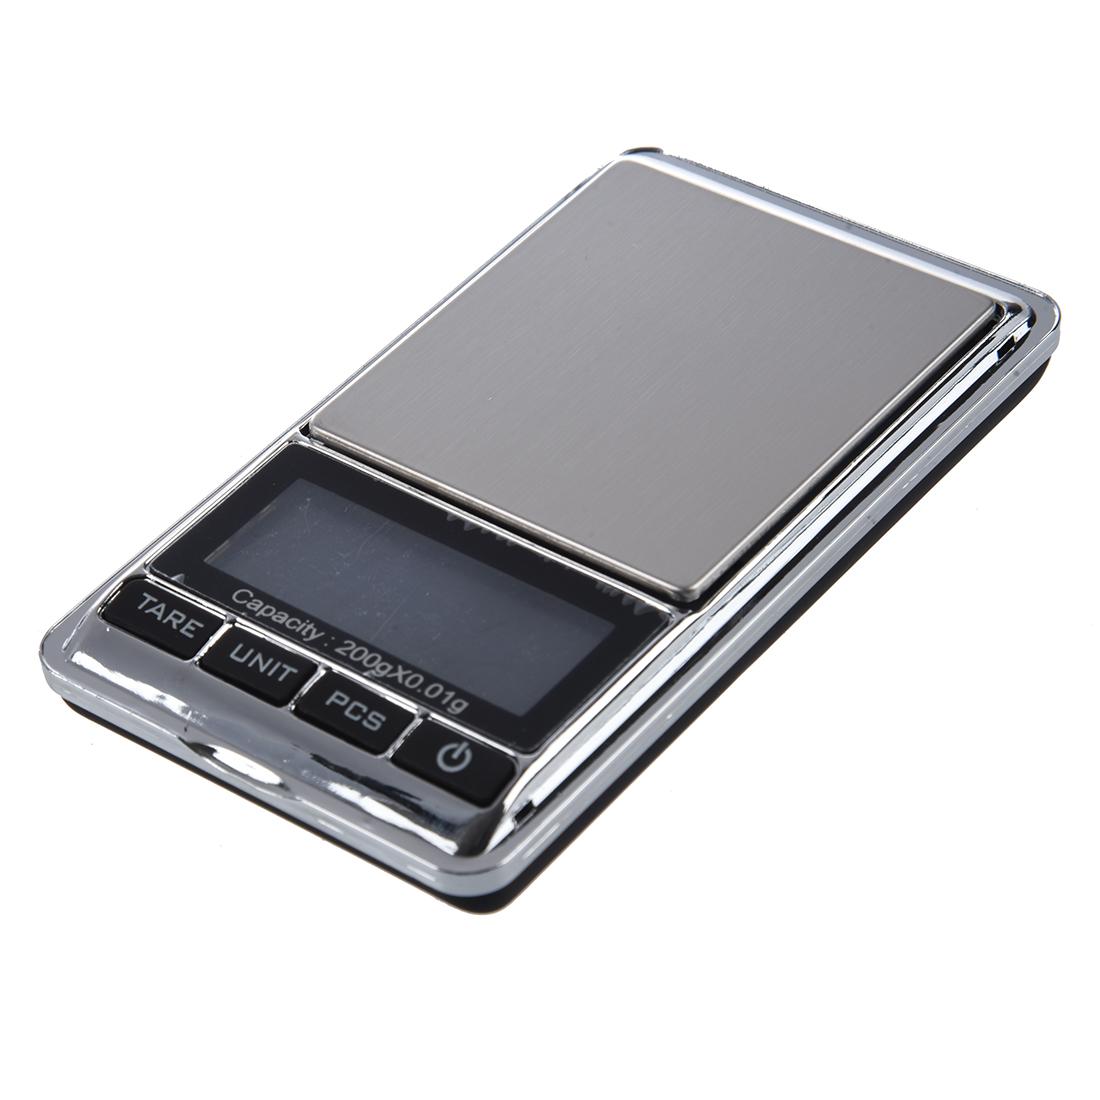 200g mini digital pocket scale for jewelry kitchen for Mini digital jewelry pocket gram scale